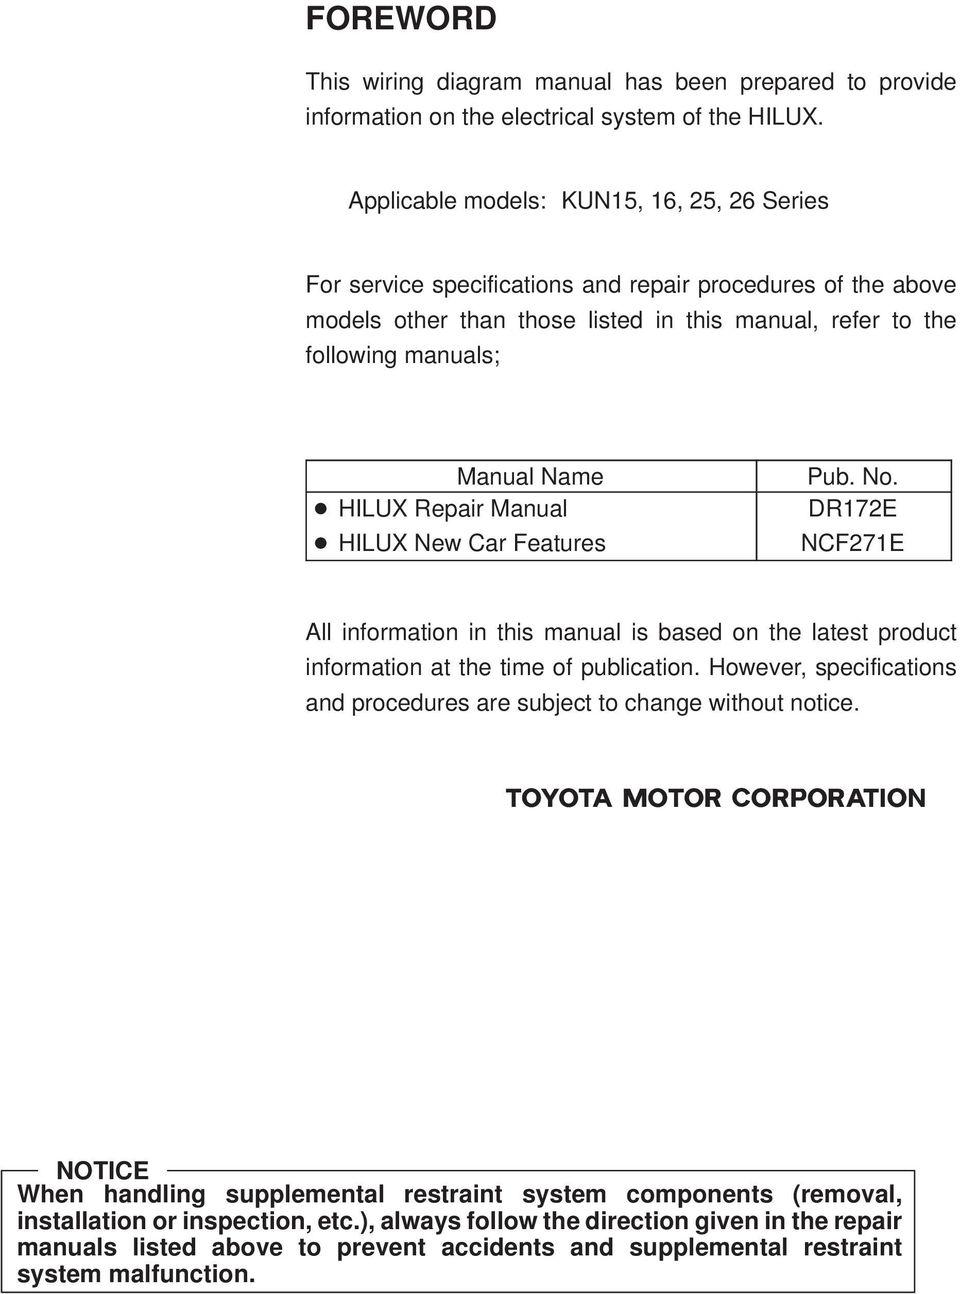 medium resolution of epair manual hiux new car features pub no d7e ncf7e ll information in this